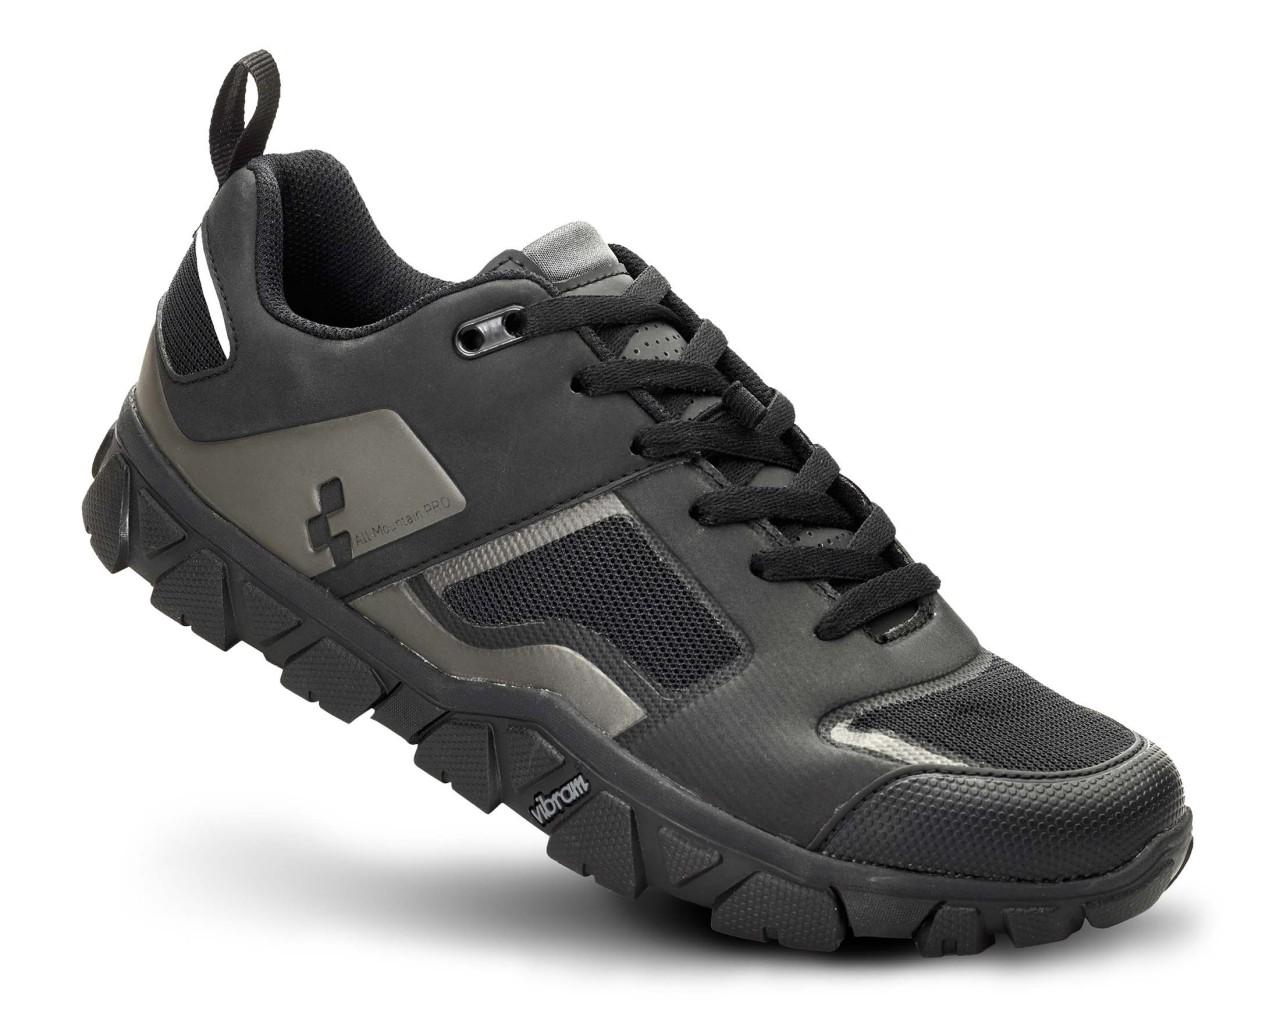 Cube Schuhe All Mountain Pro Lace   blackline